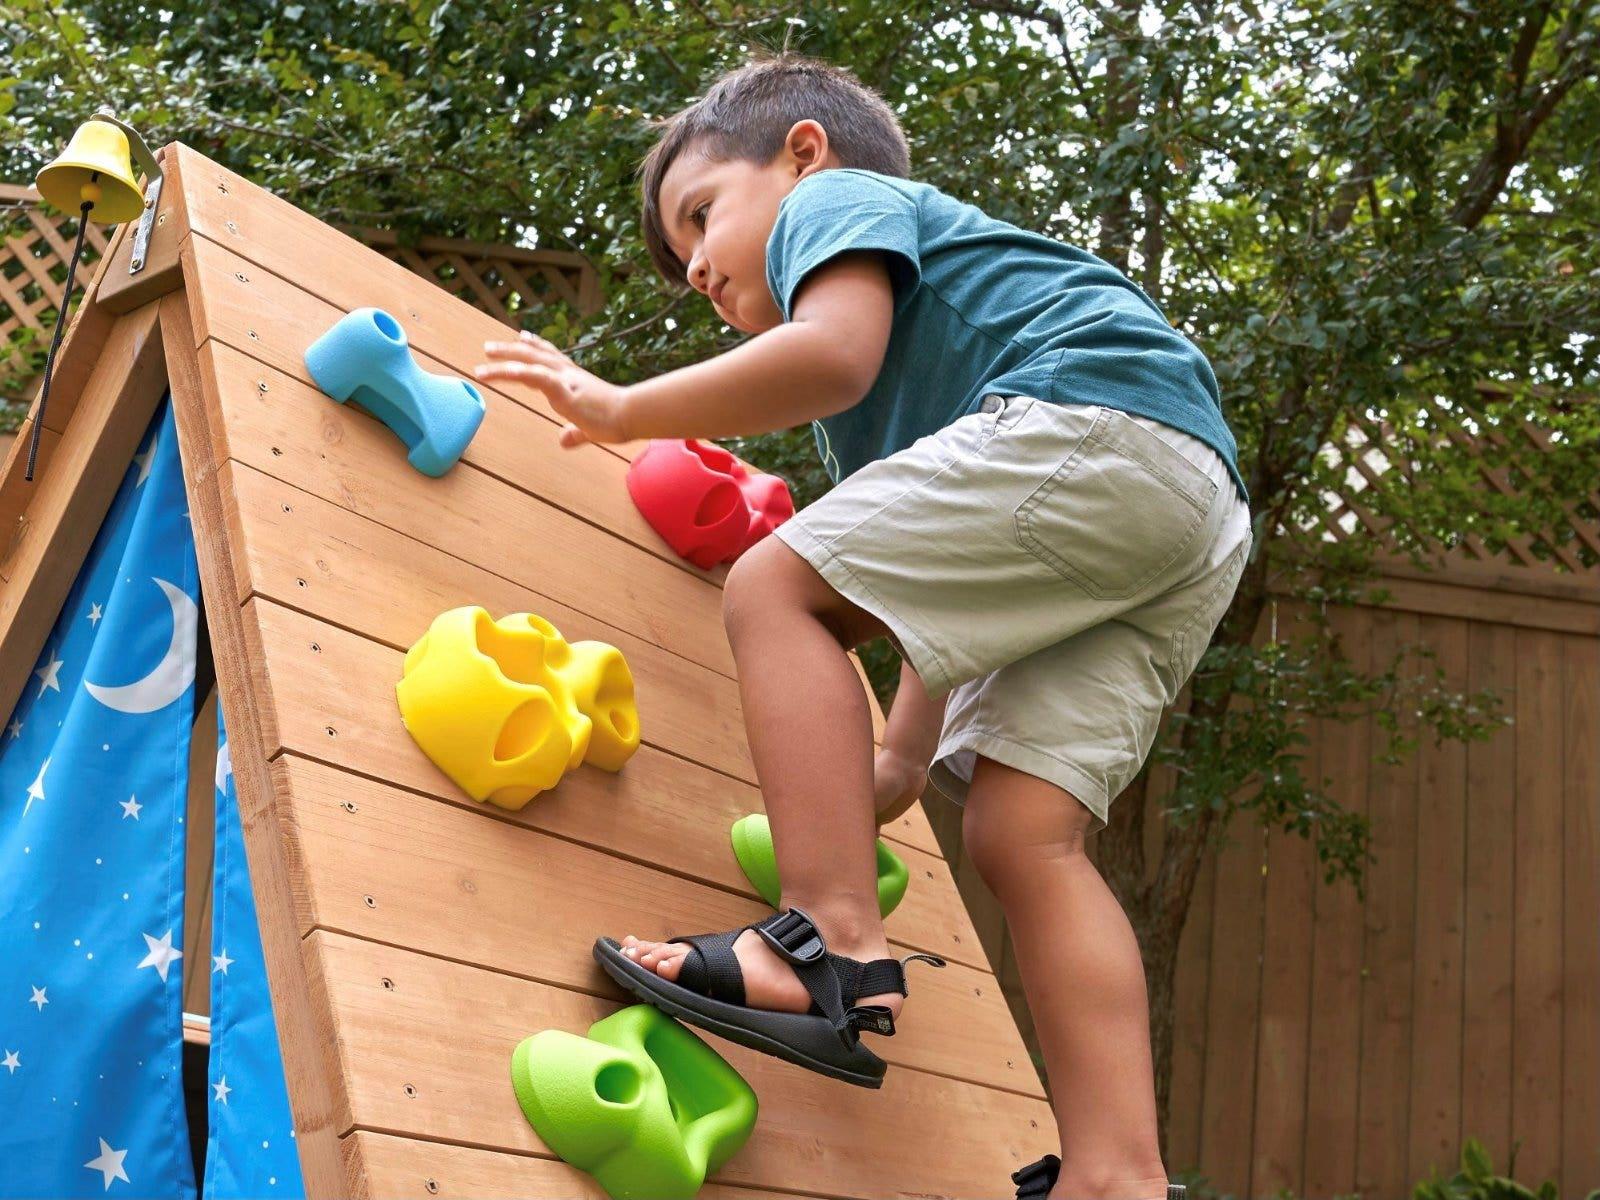 Child climbing up KidKraft outdoor climber